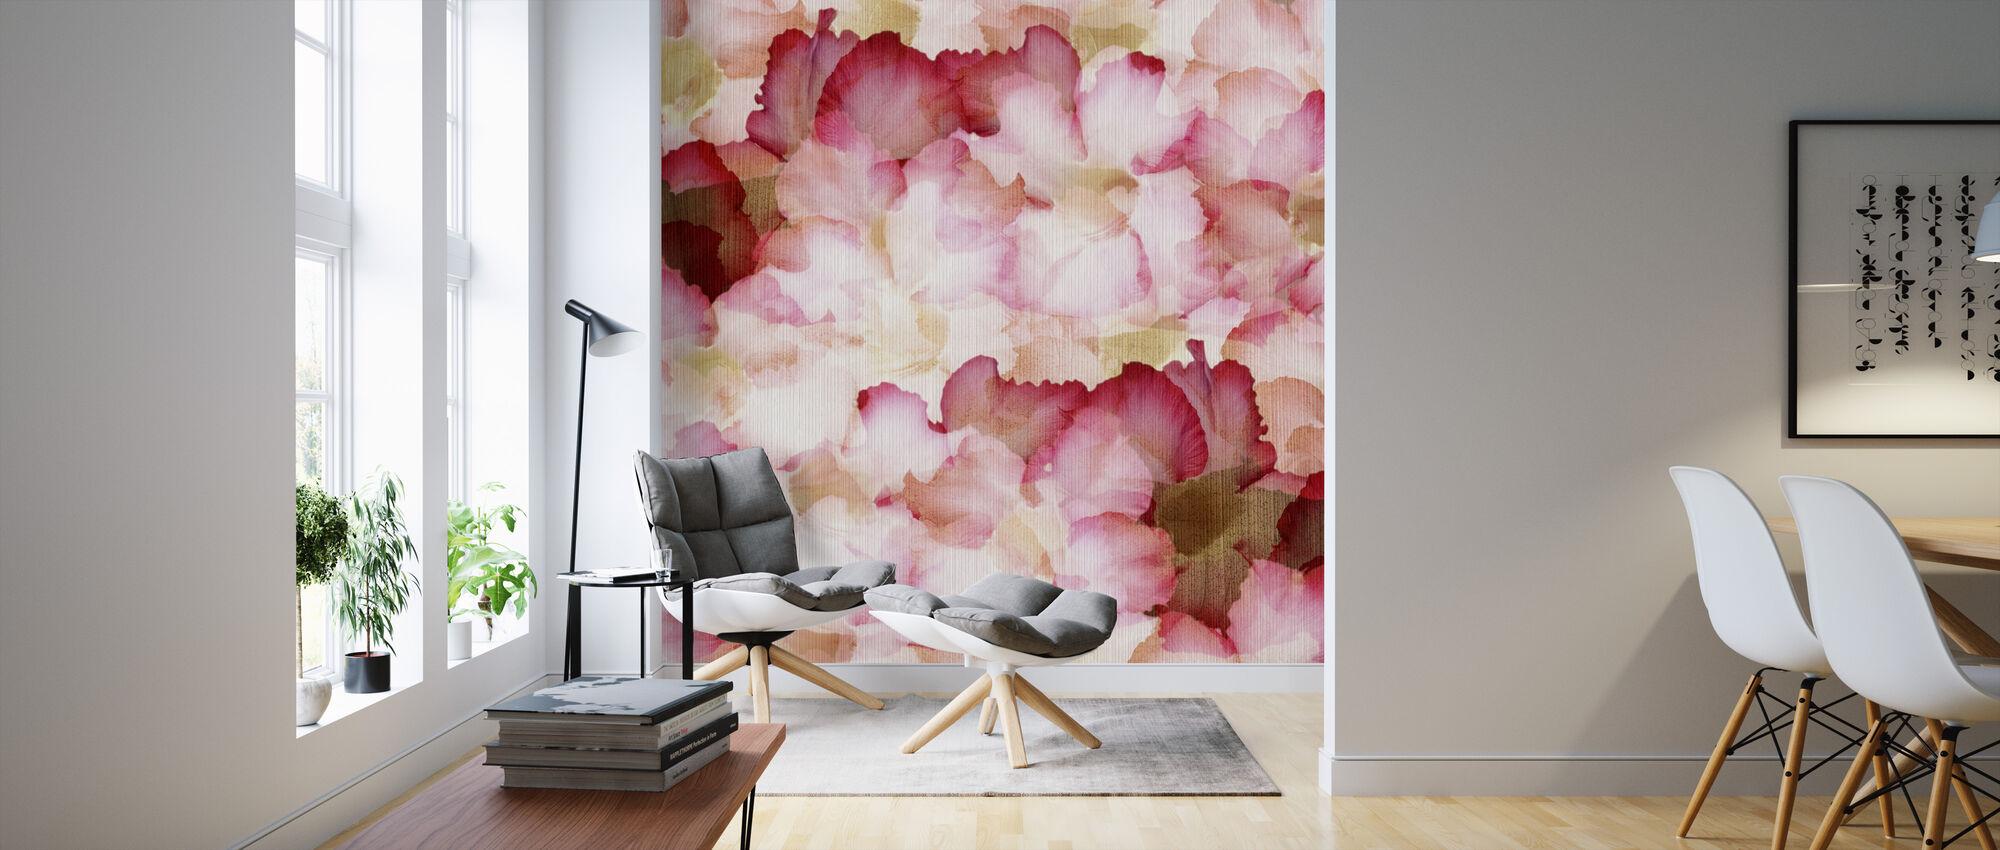 Desert Rose Petals - Wallpaper - Living Room